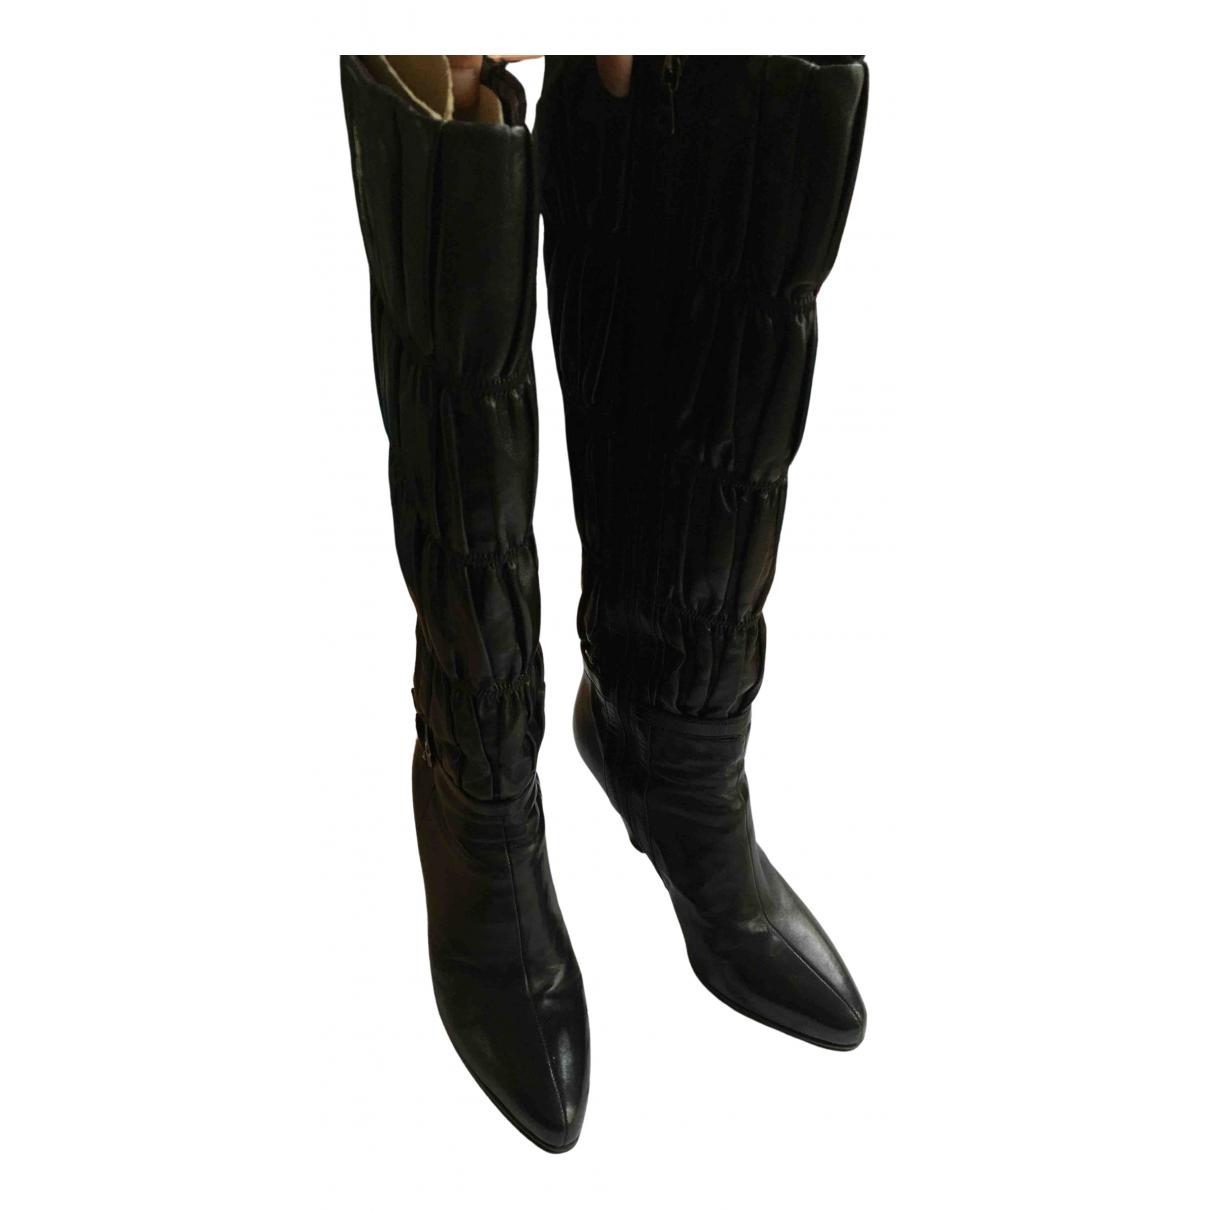 Prada N Black Leather Boots for Women 36 EU